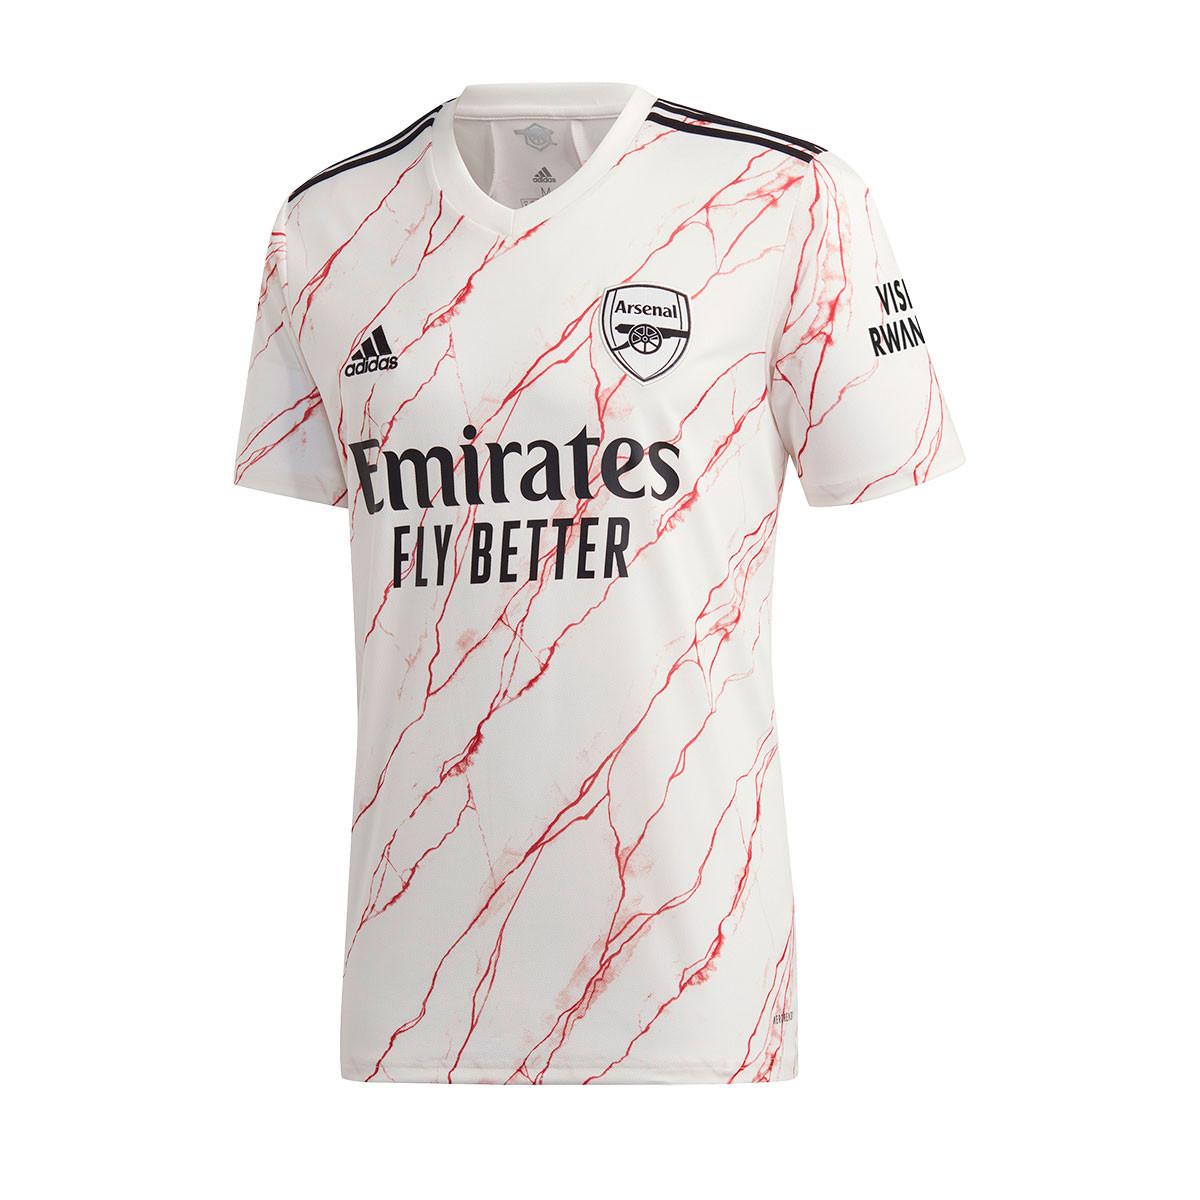 Jersey Adidas Arsenal Fc 2020 2021 Away Cloud White Black Football Store Futbol Emotion